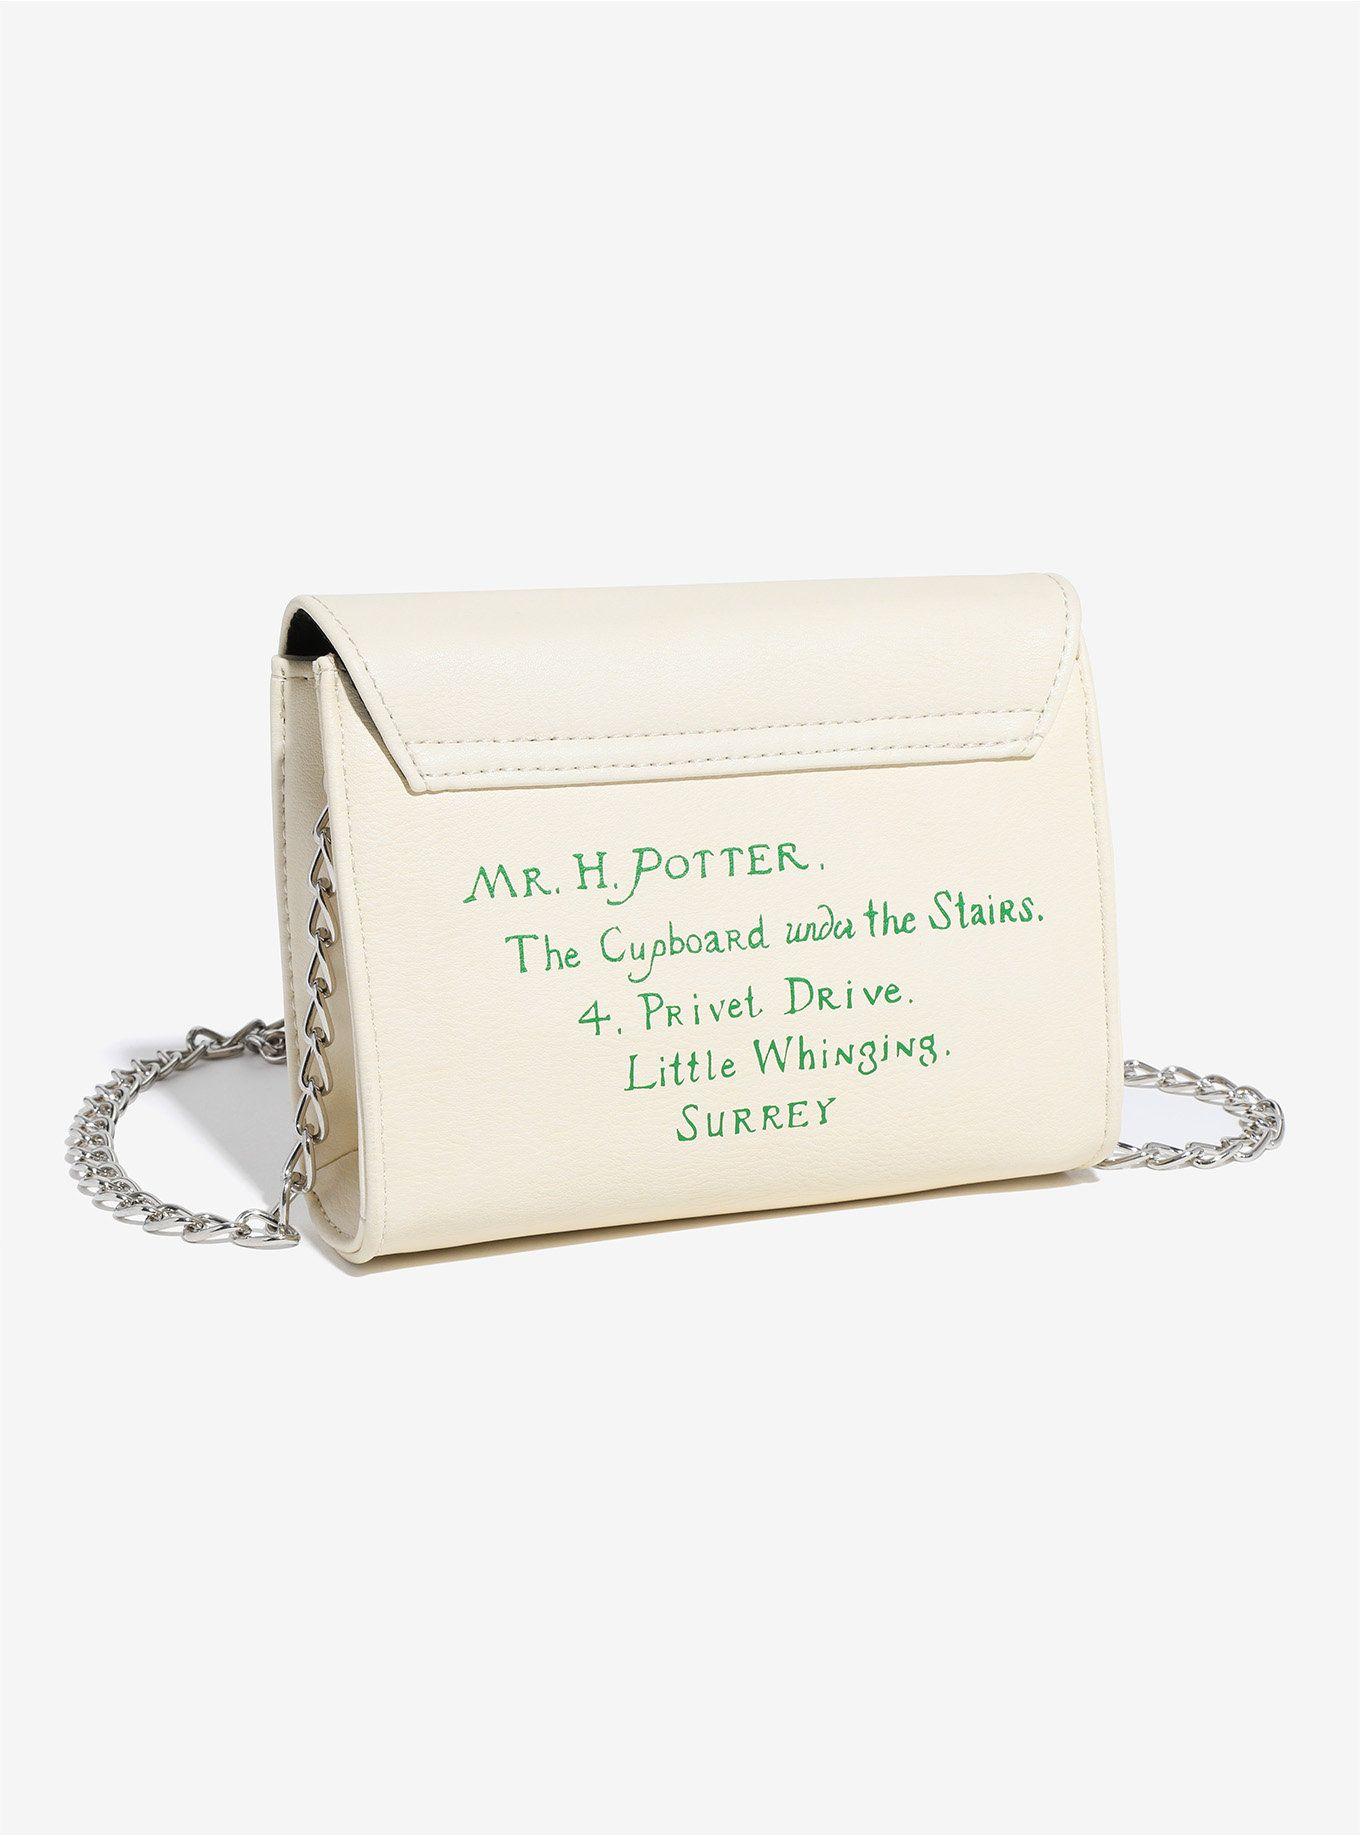 Harry Potter Hogwarts Letter Crossbody Bag Harry potter